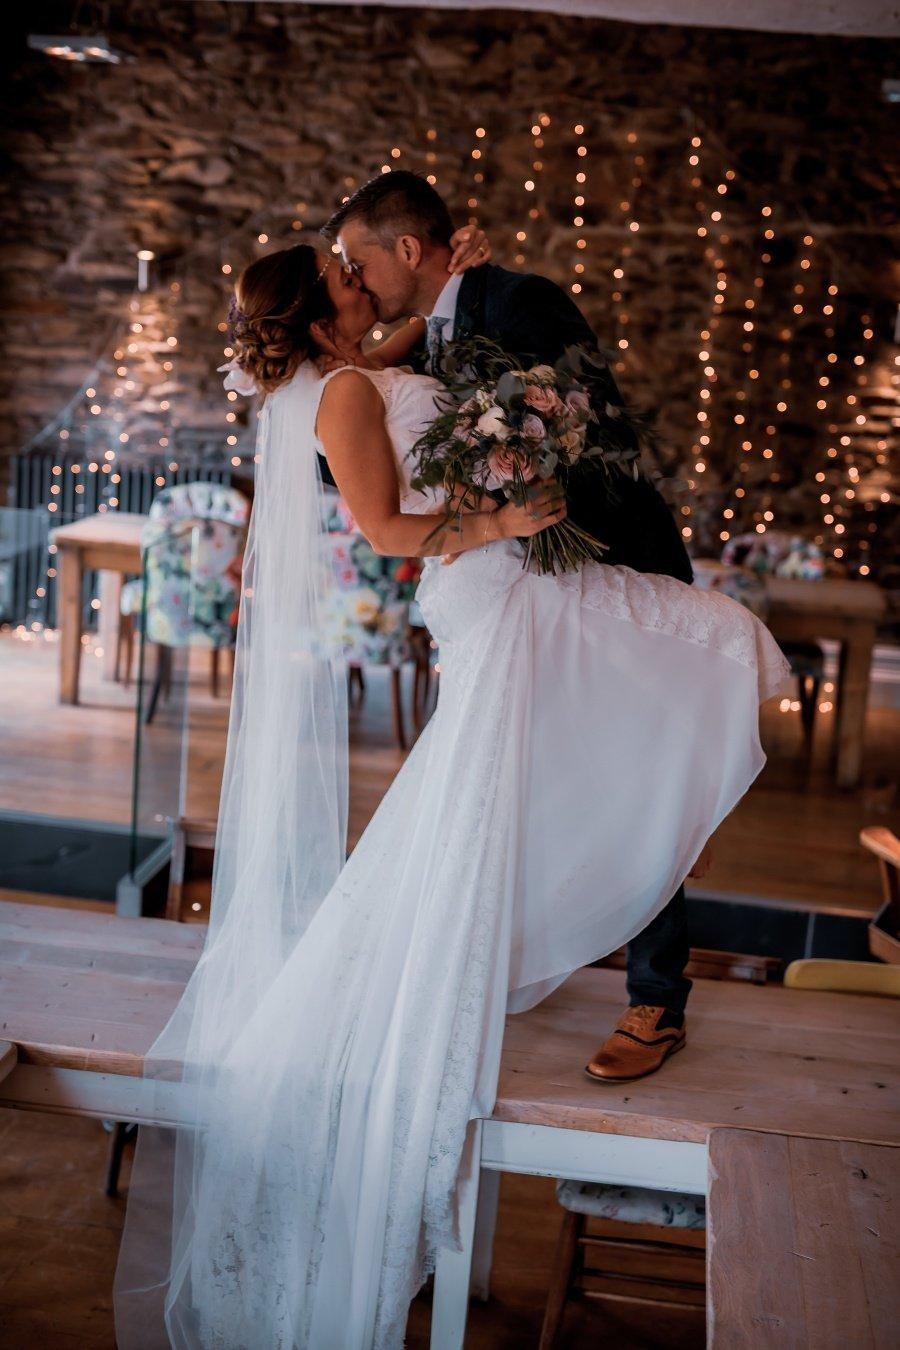 Svadbu si skutočne užili